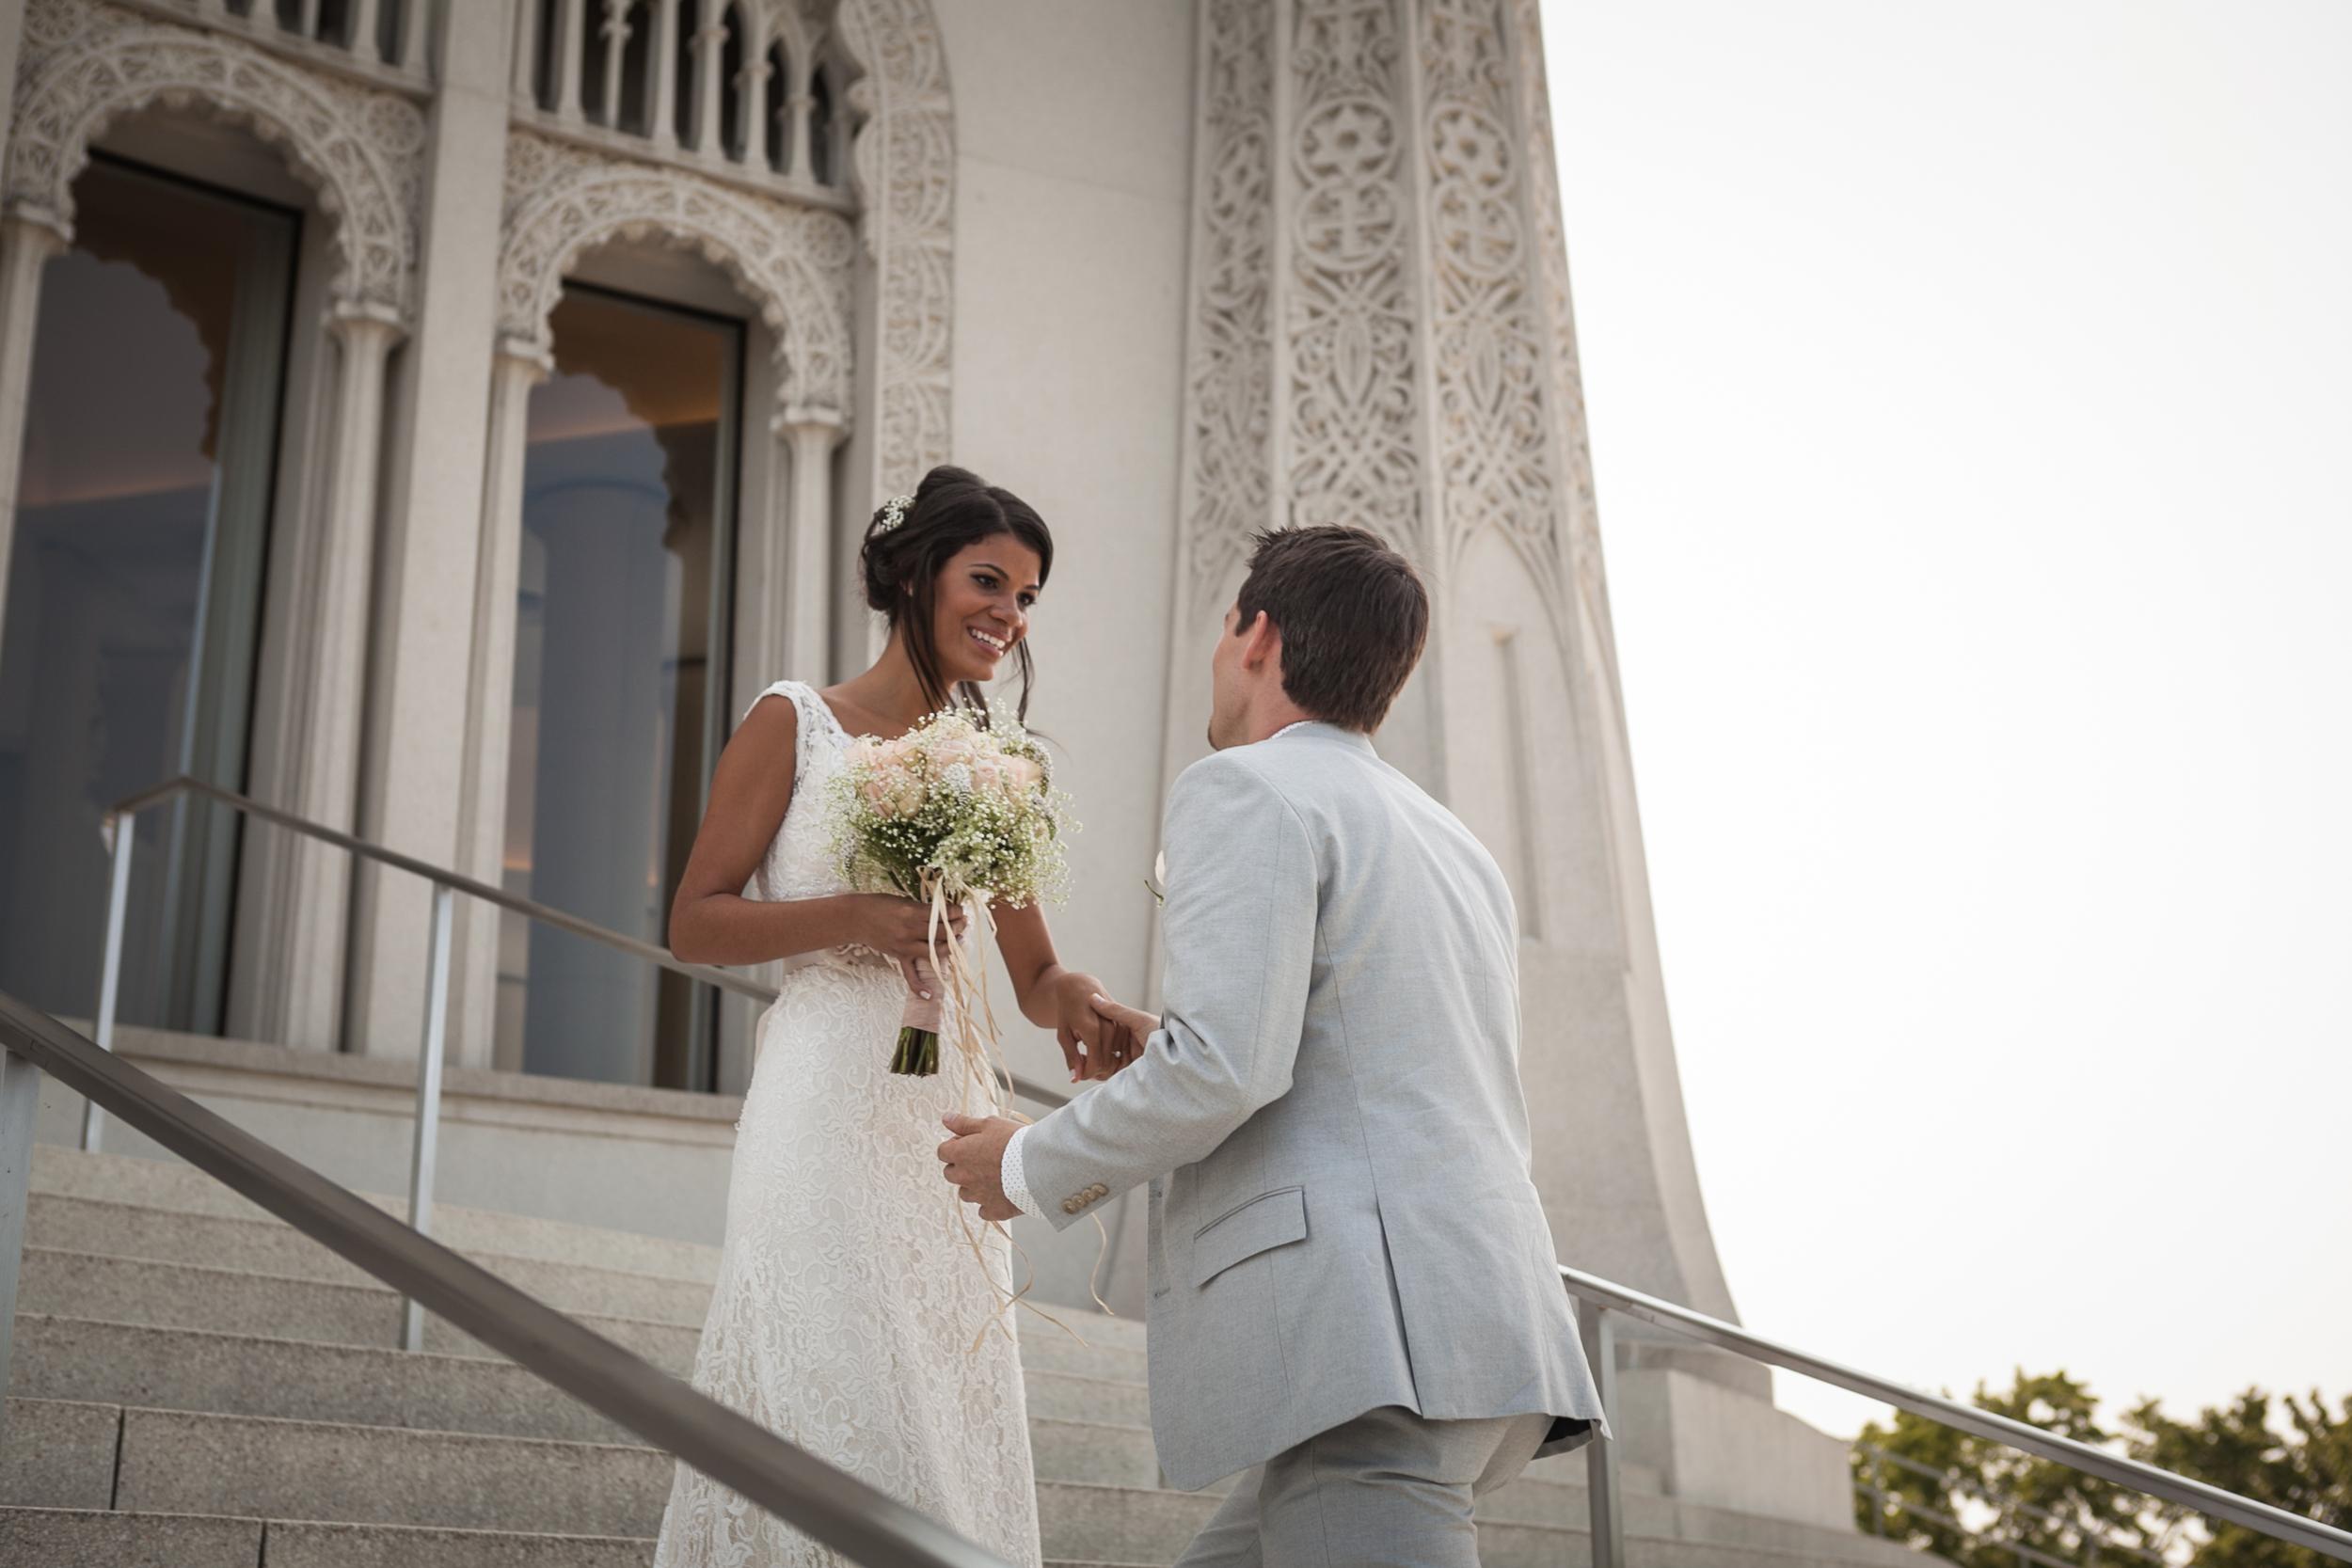 Shi & Micah wedding at Bahá'í Temple blog-11.jpg